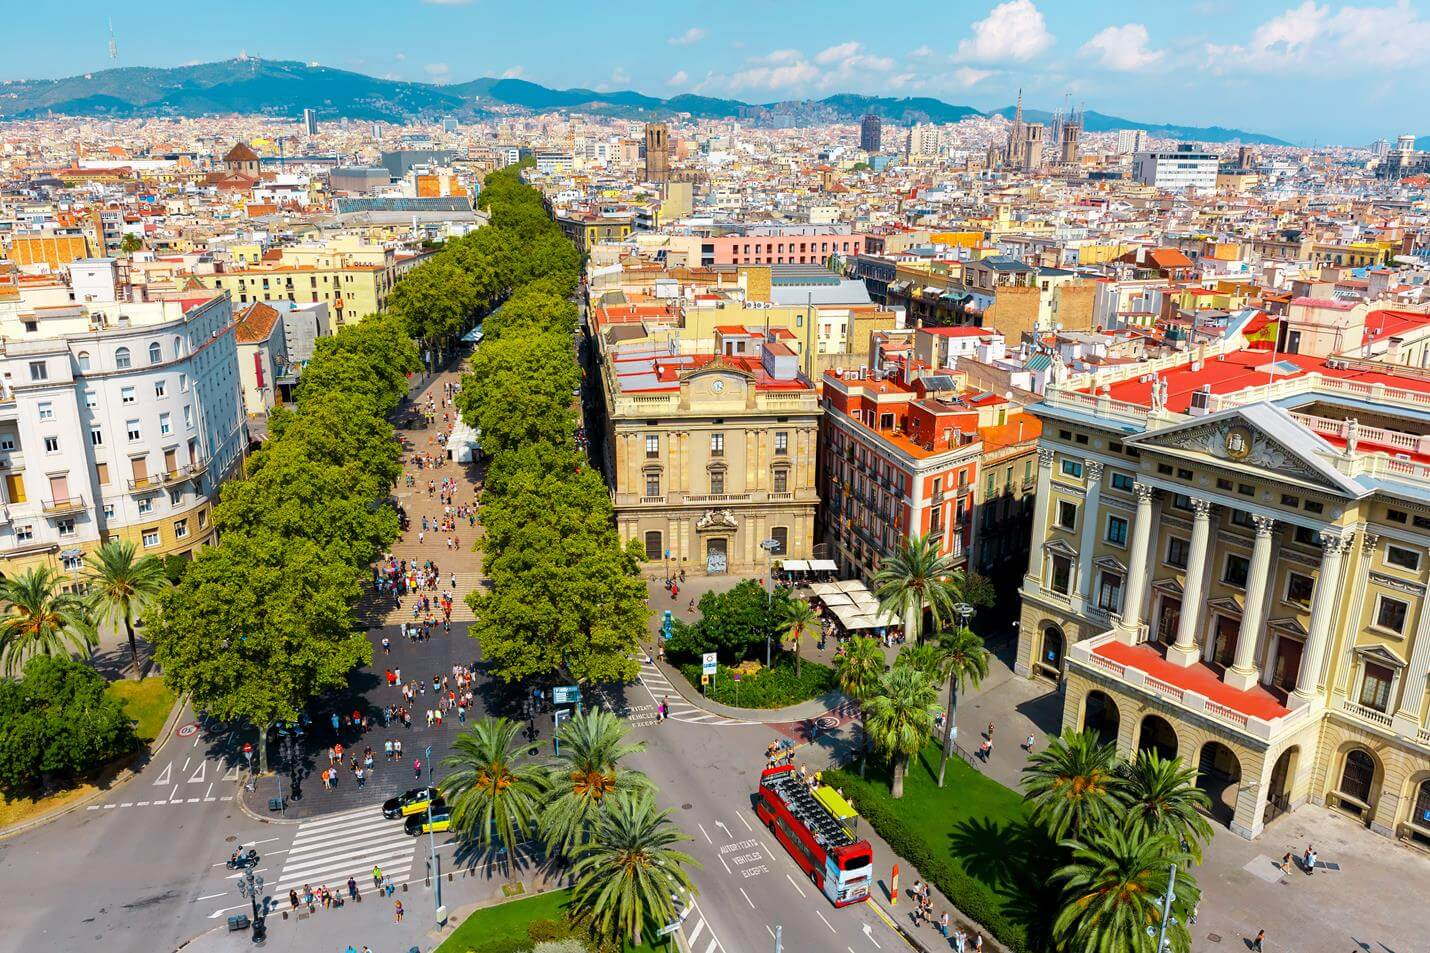 La Rambla in Barcelona - Top